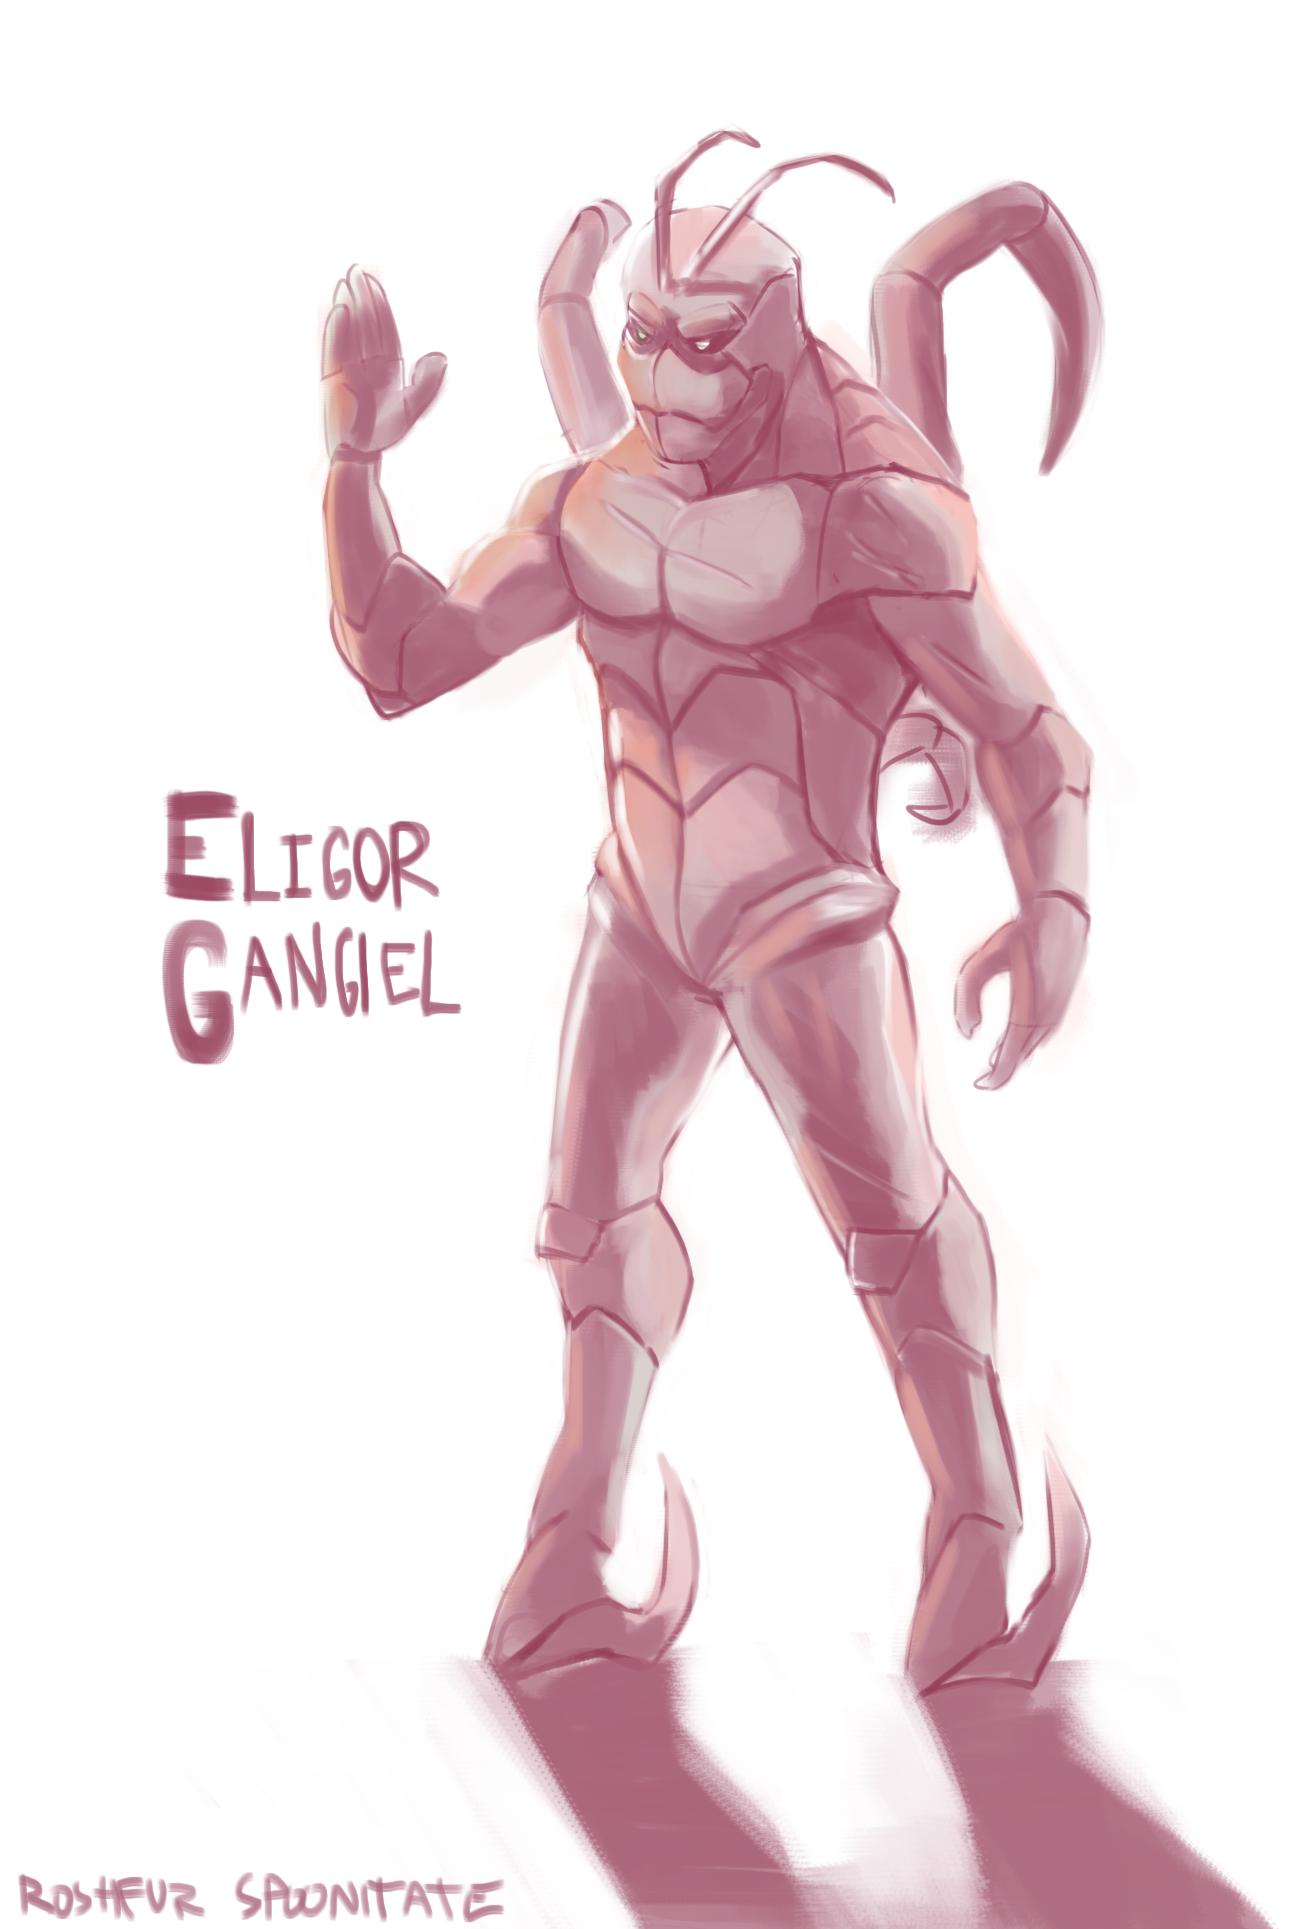 Eligor Gangiel